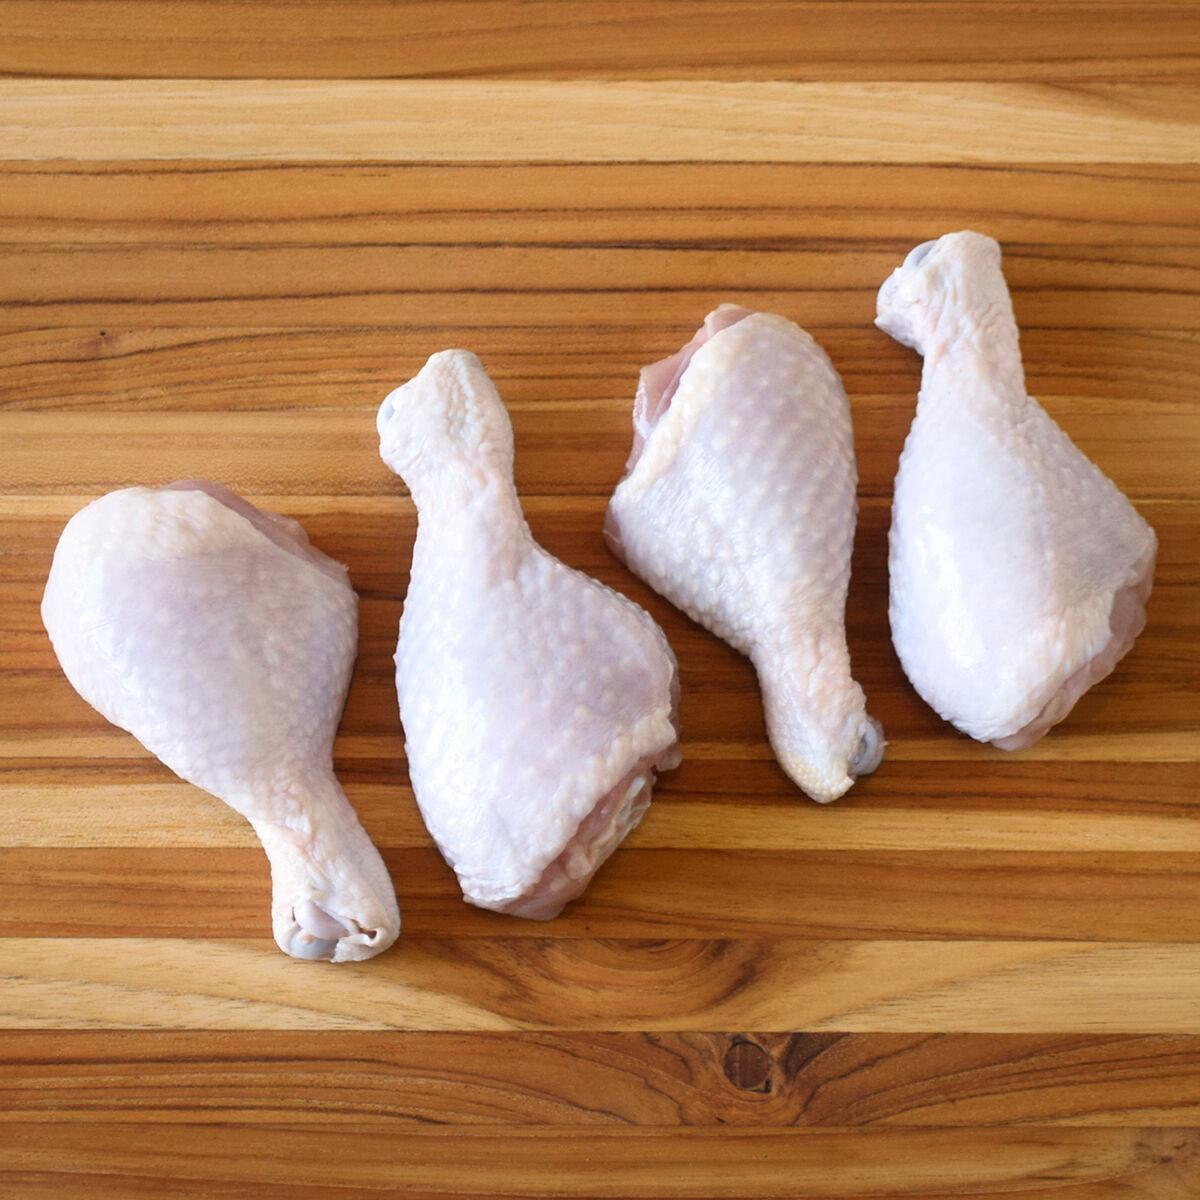 D'Artagnan Organic Chicken Drumsticks: Fresh (4lb case 4 1lb avg packs avg. each)  by D'Artagnan